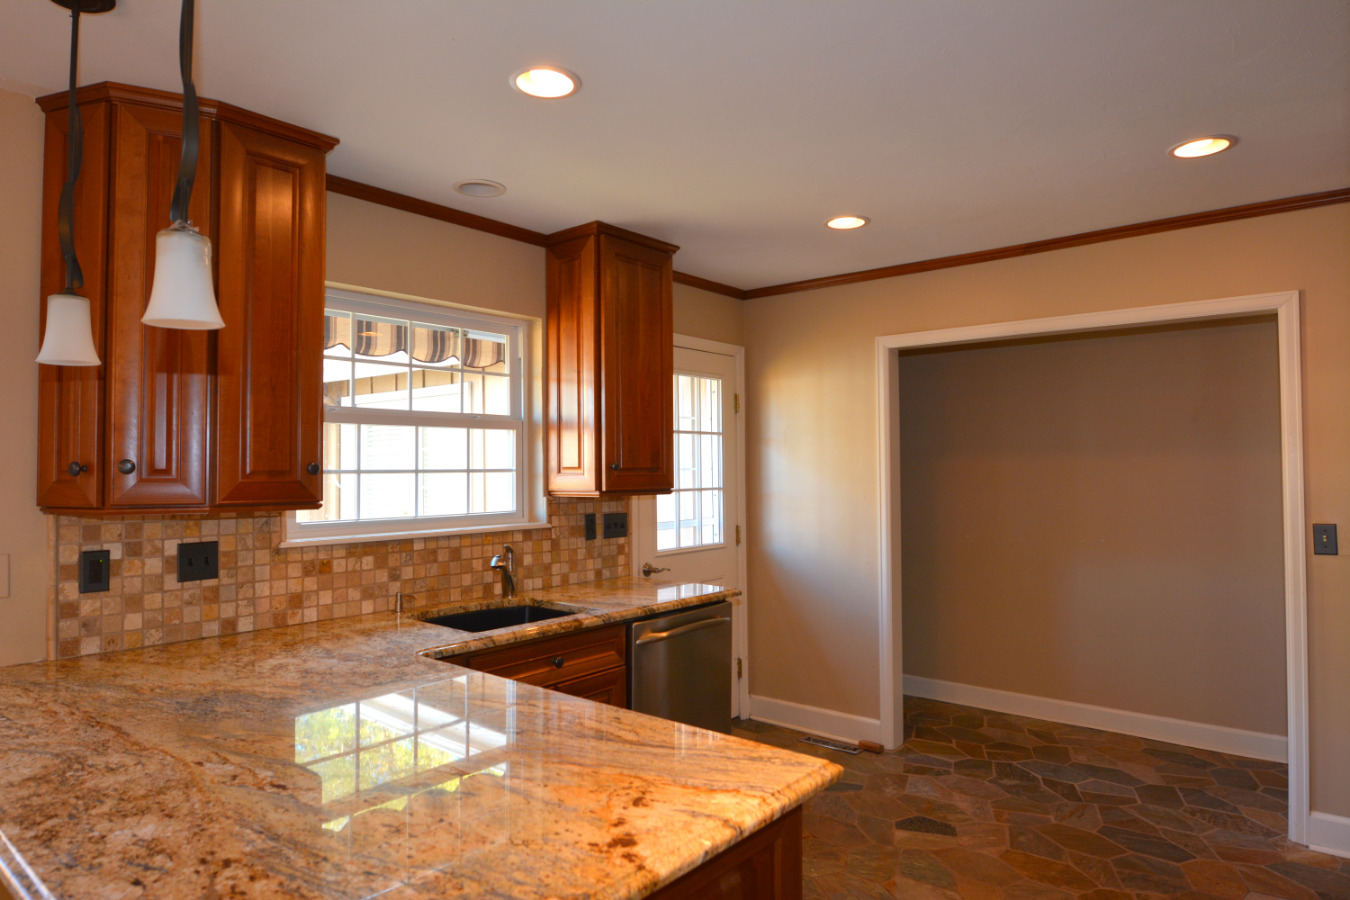 Granite Countertops and Cherry Cabinets!